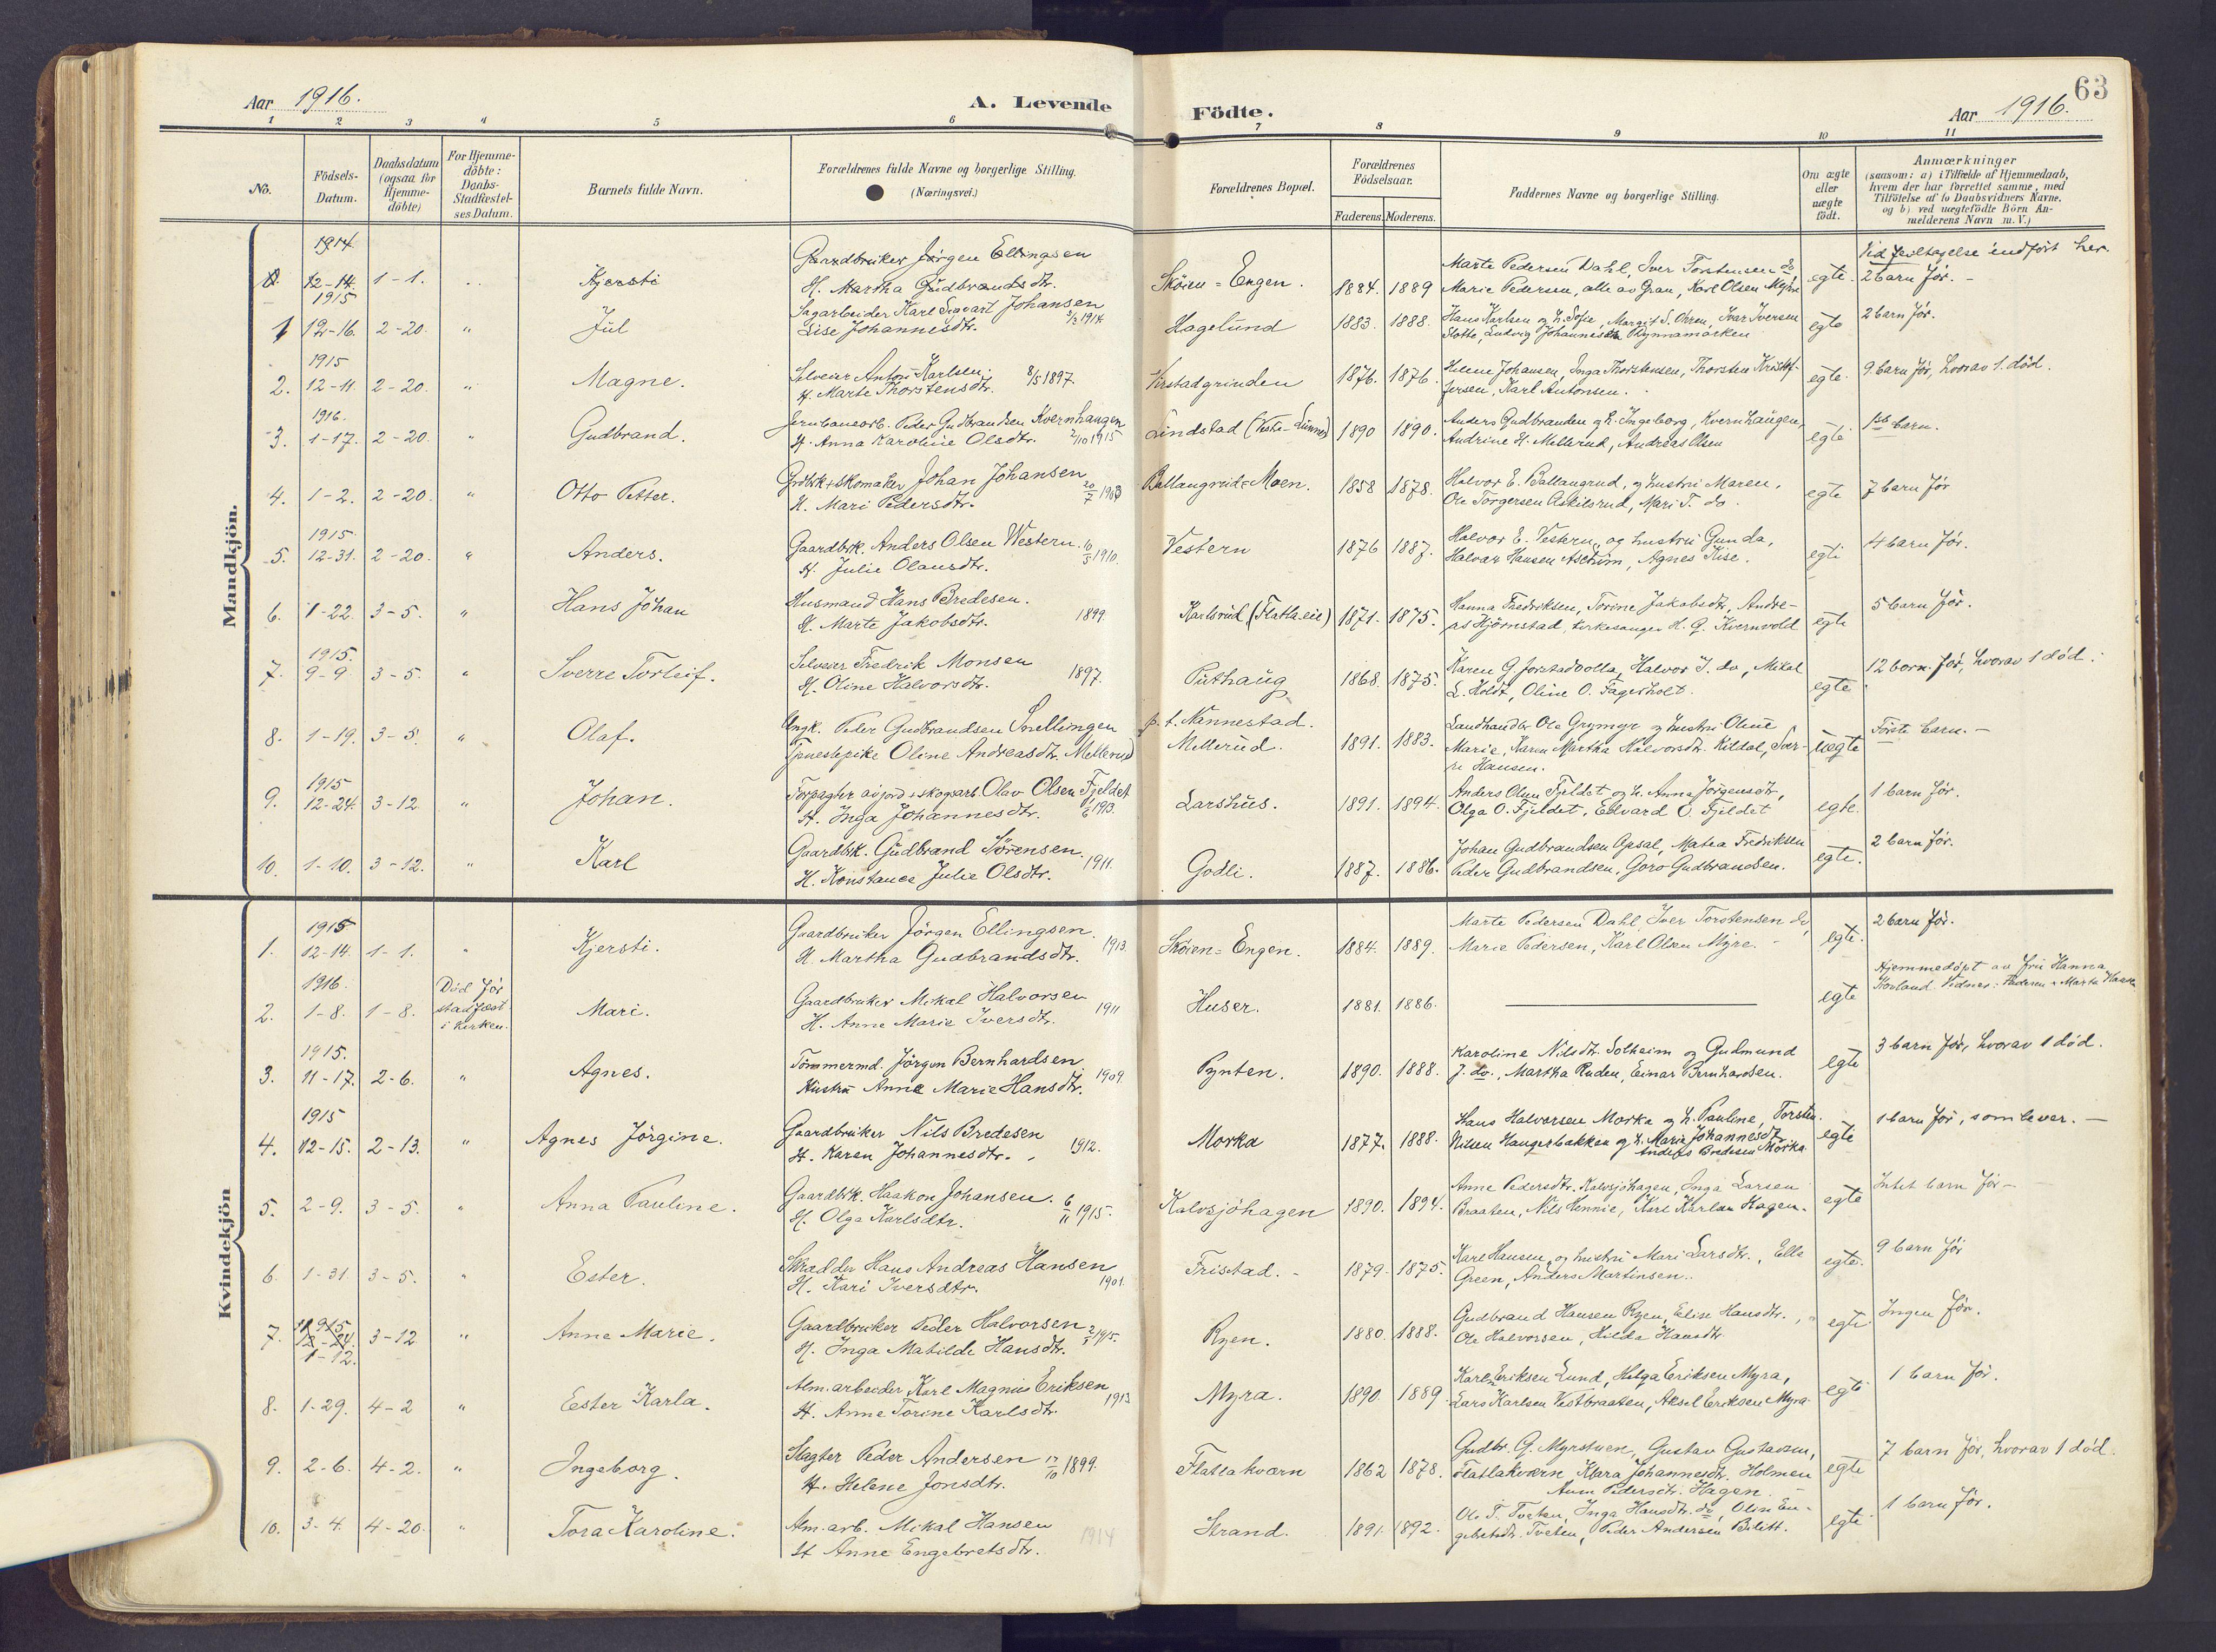 SAH, Lunner prestekontor, H/Ha/Haa/L0001: Ministerialbok nr. 1, 1907-1922, s. 63